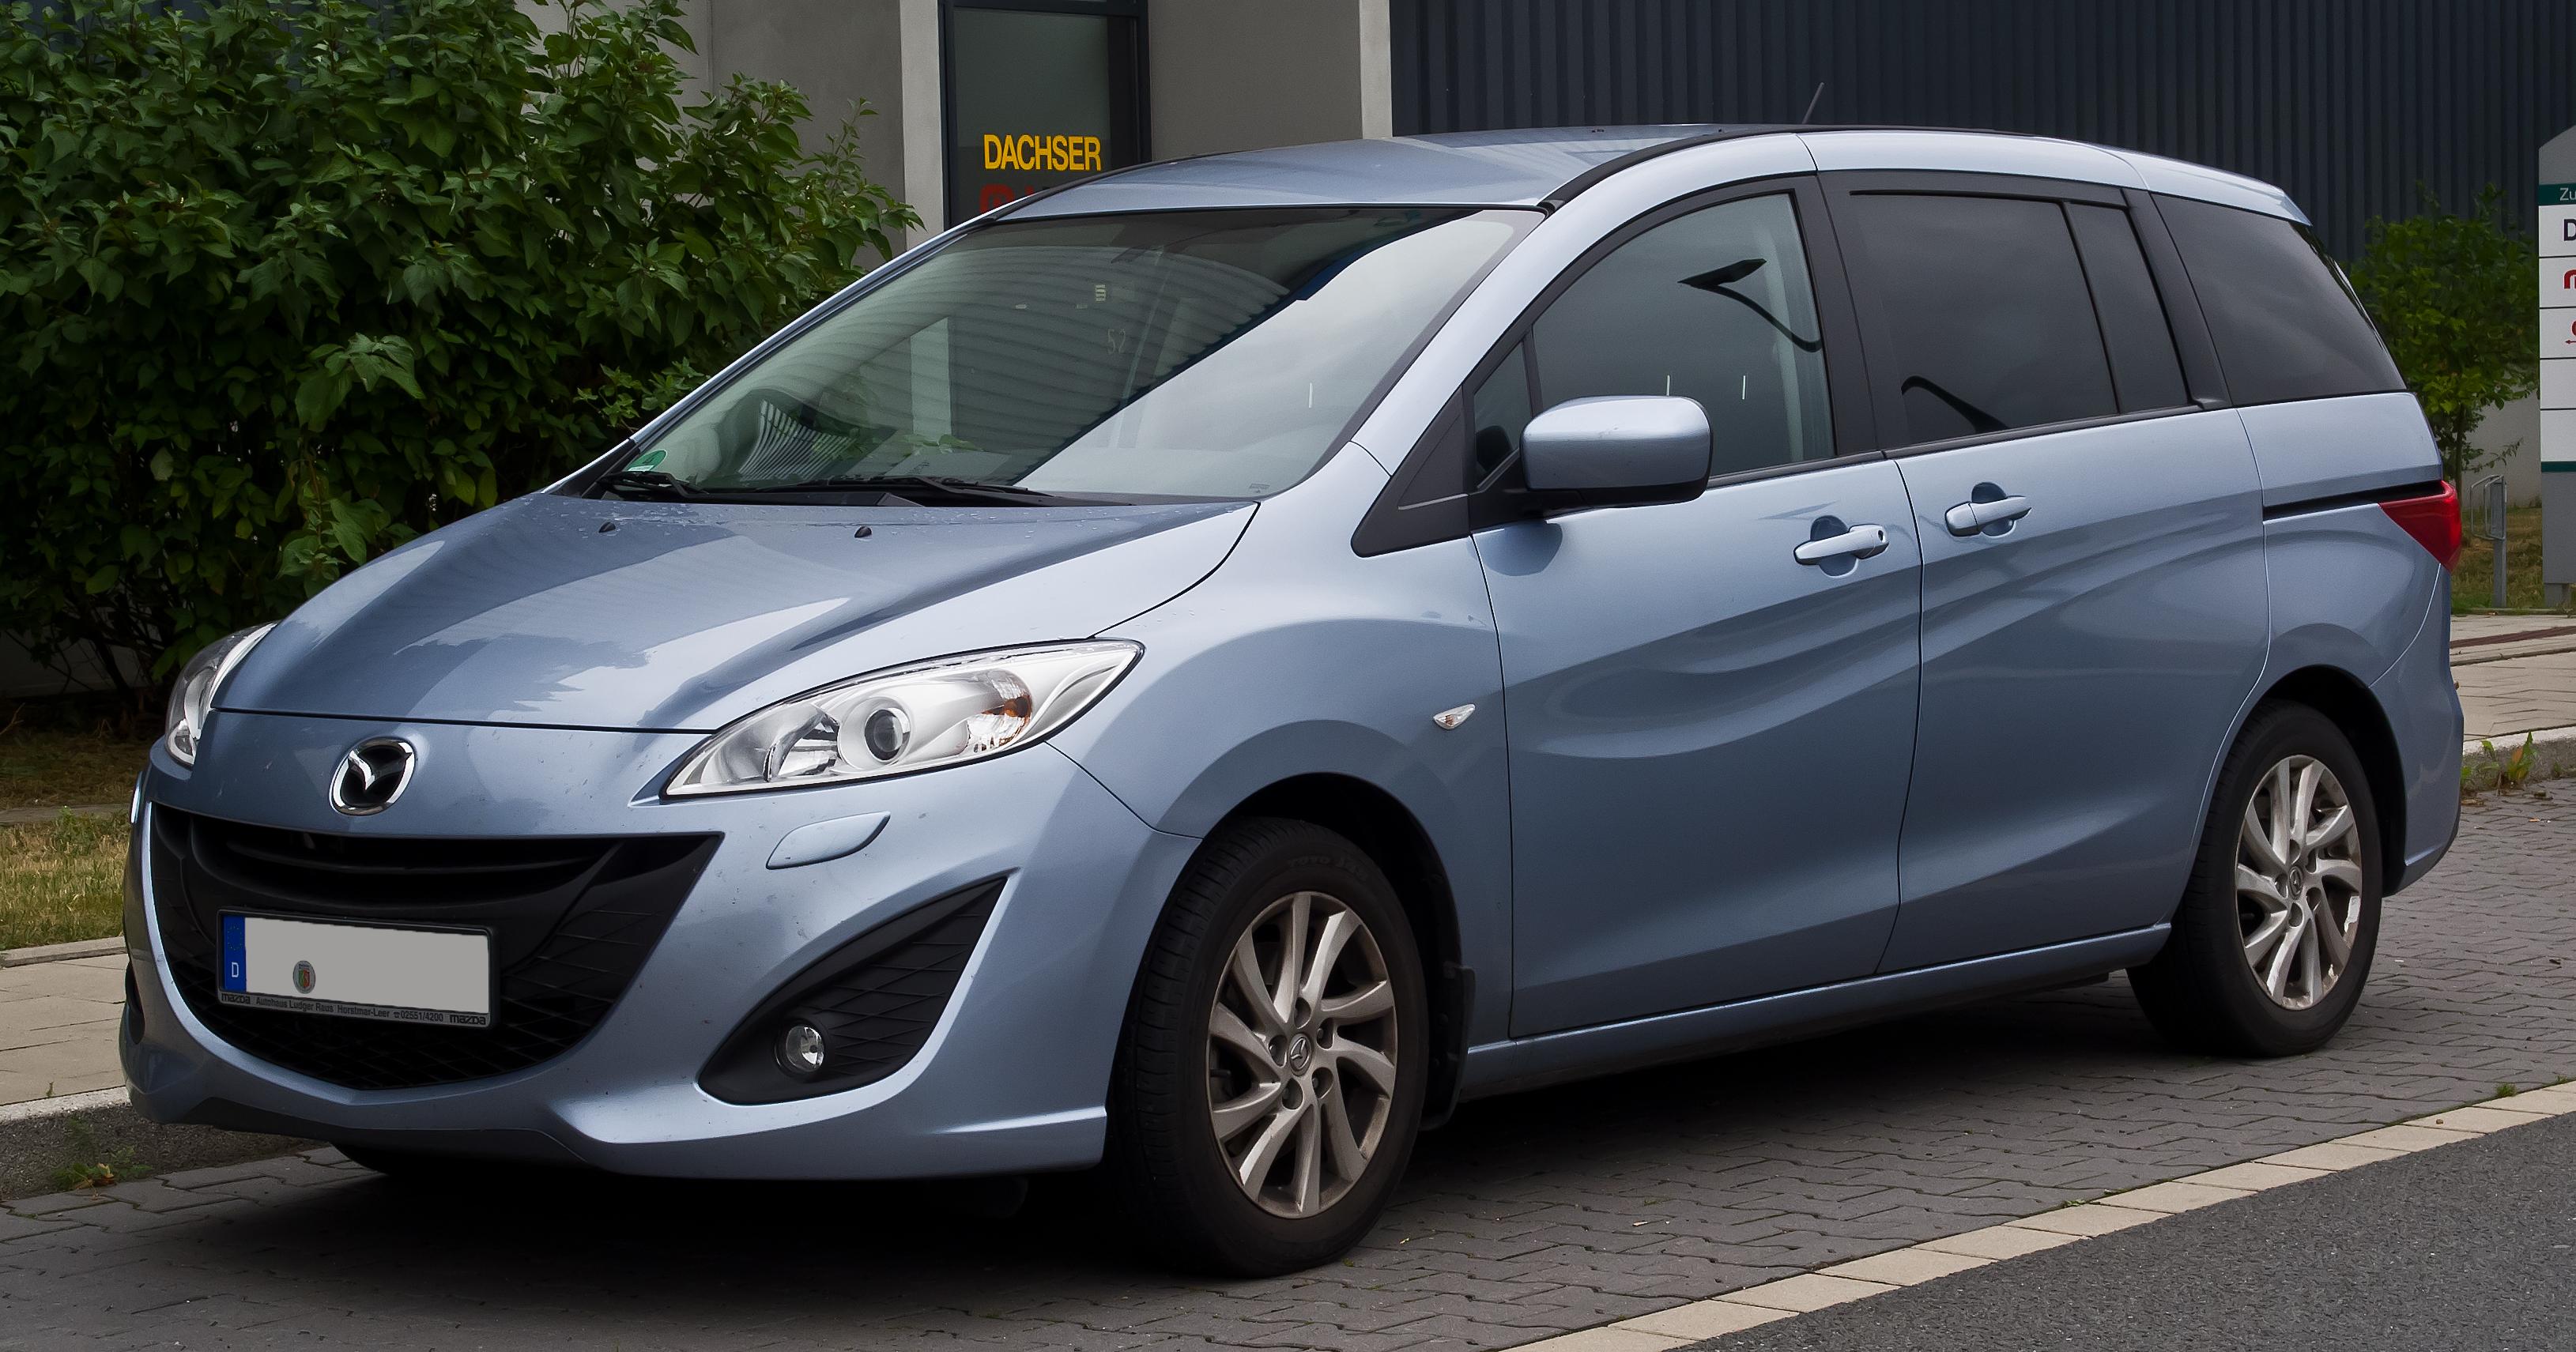 File:Mazda5 (II) – Frontansicht, 25. August 2013, Düsseldorf.jpg - Wikimedia Commons